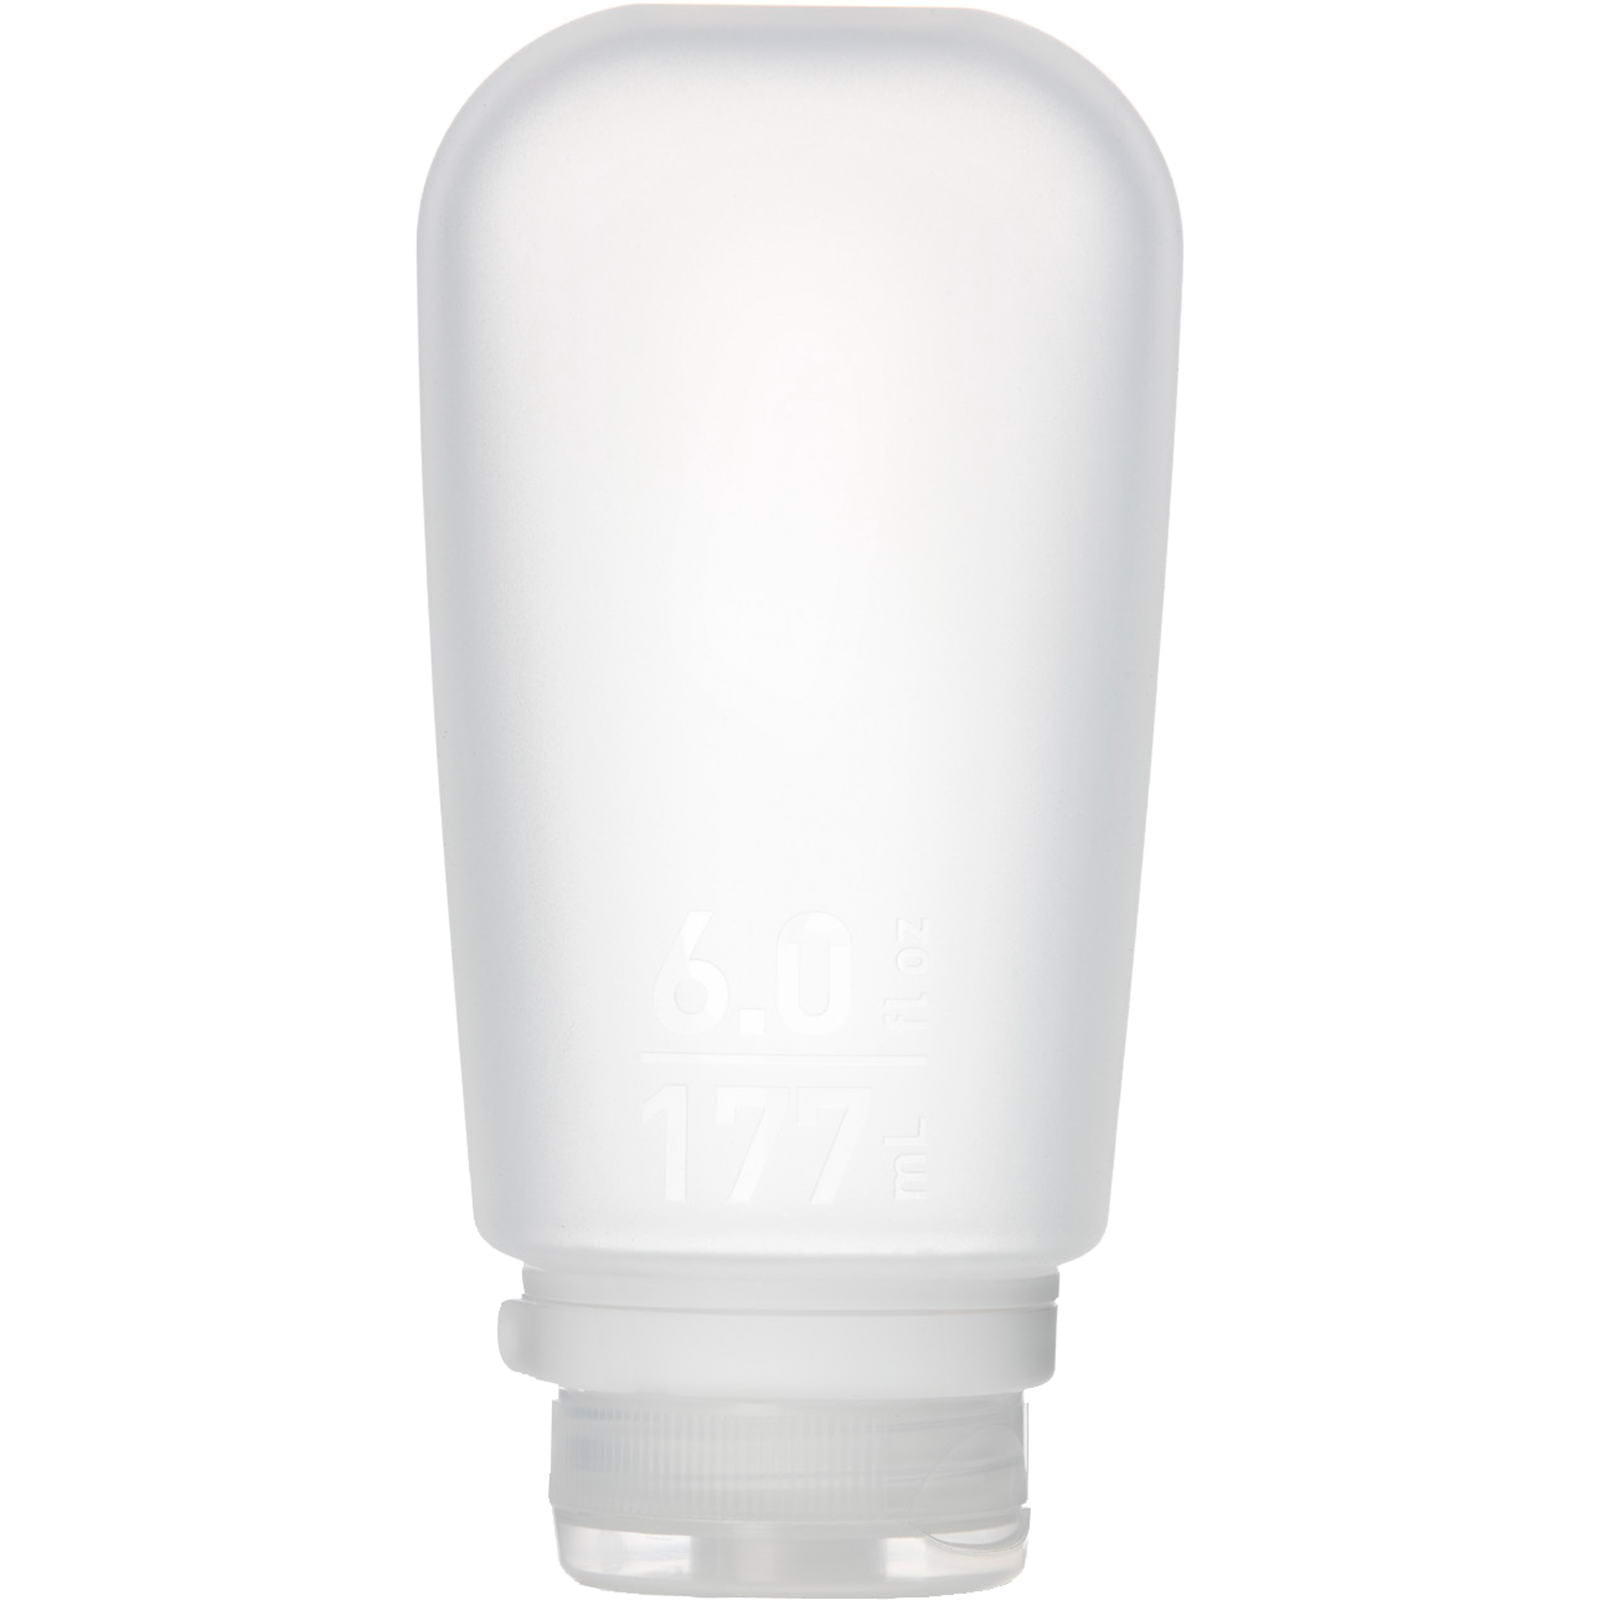 humangear GoToob - 177 ml Tube transparent - Bild 1